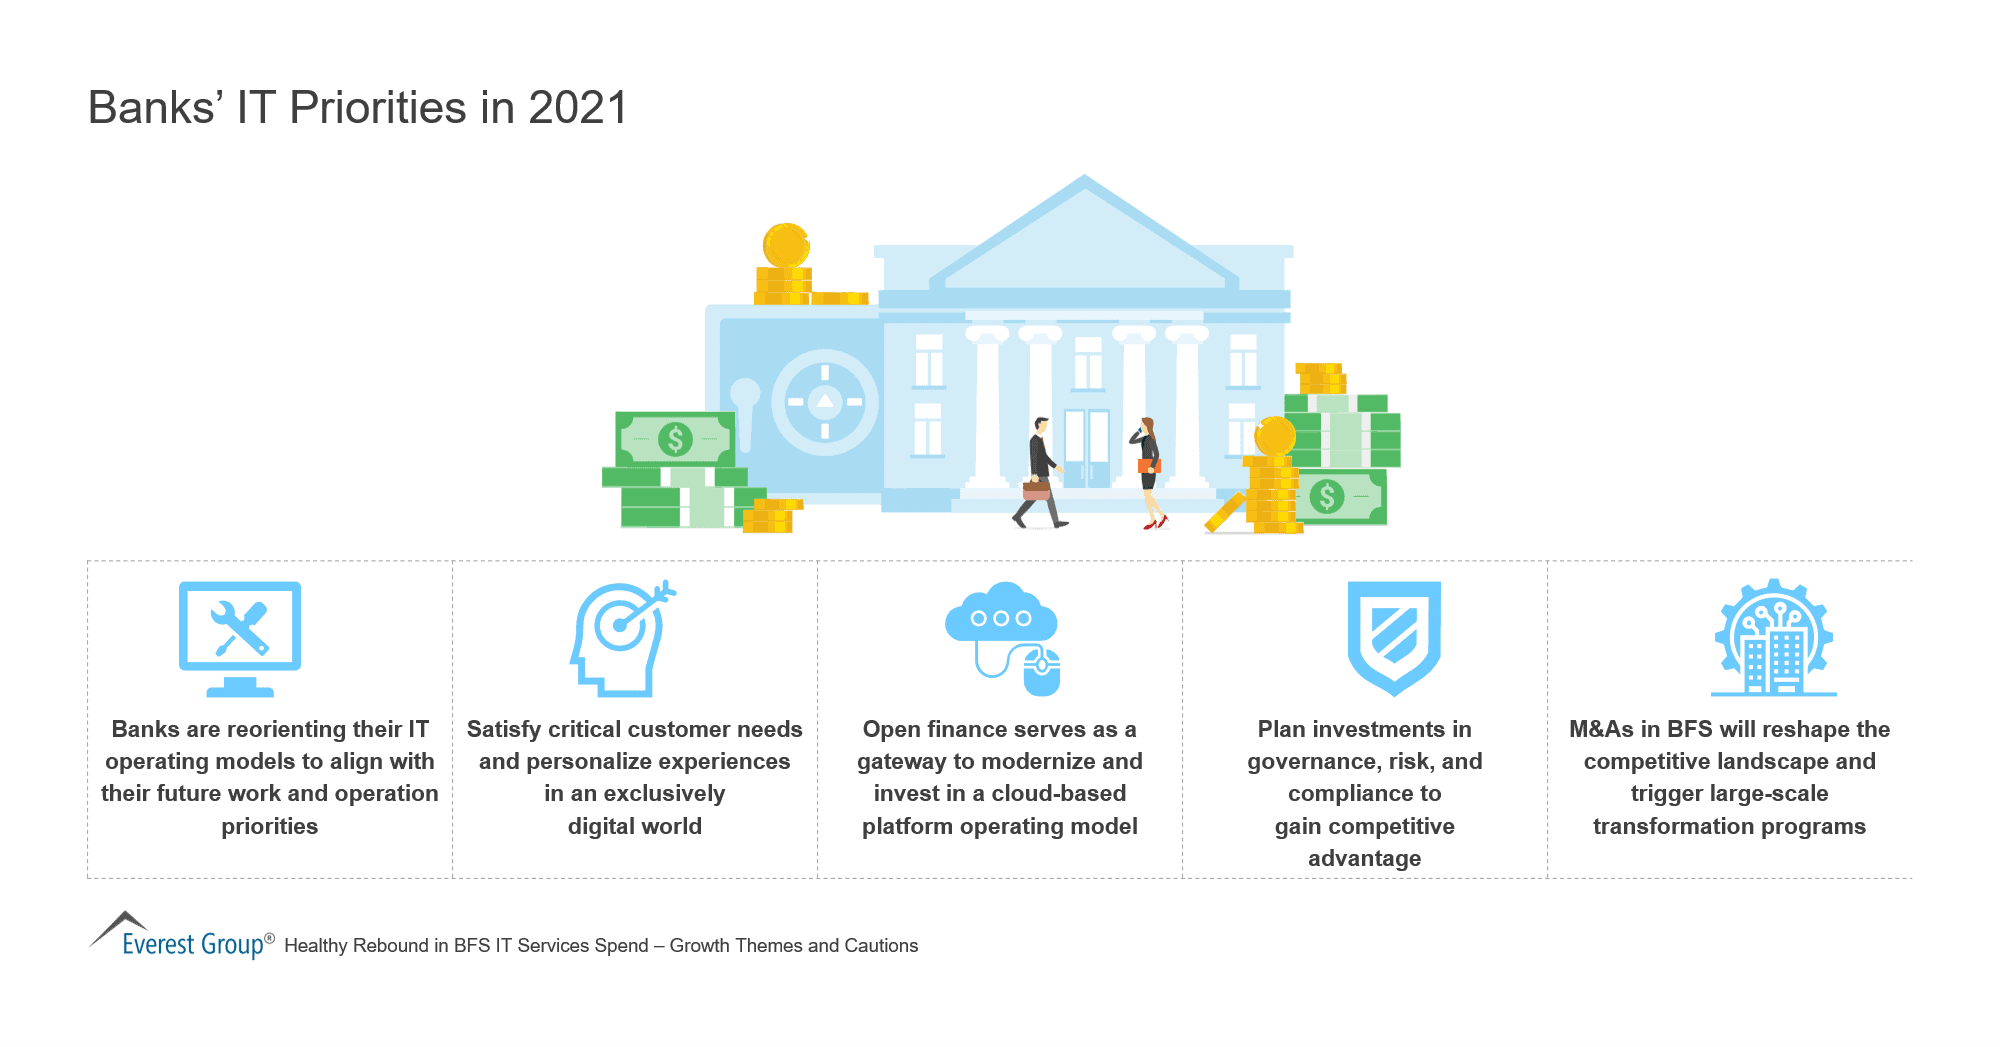 IT Priorities of Banks in 2021